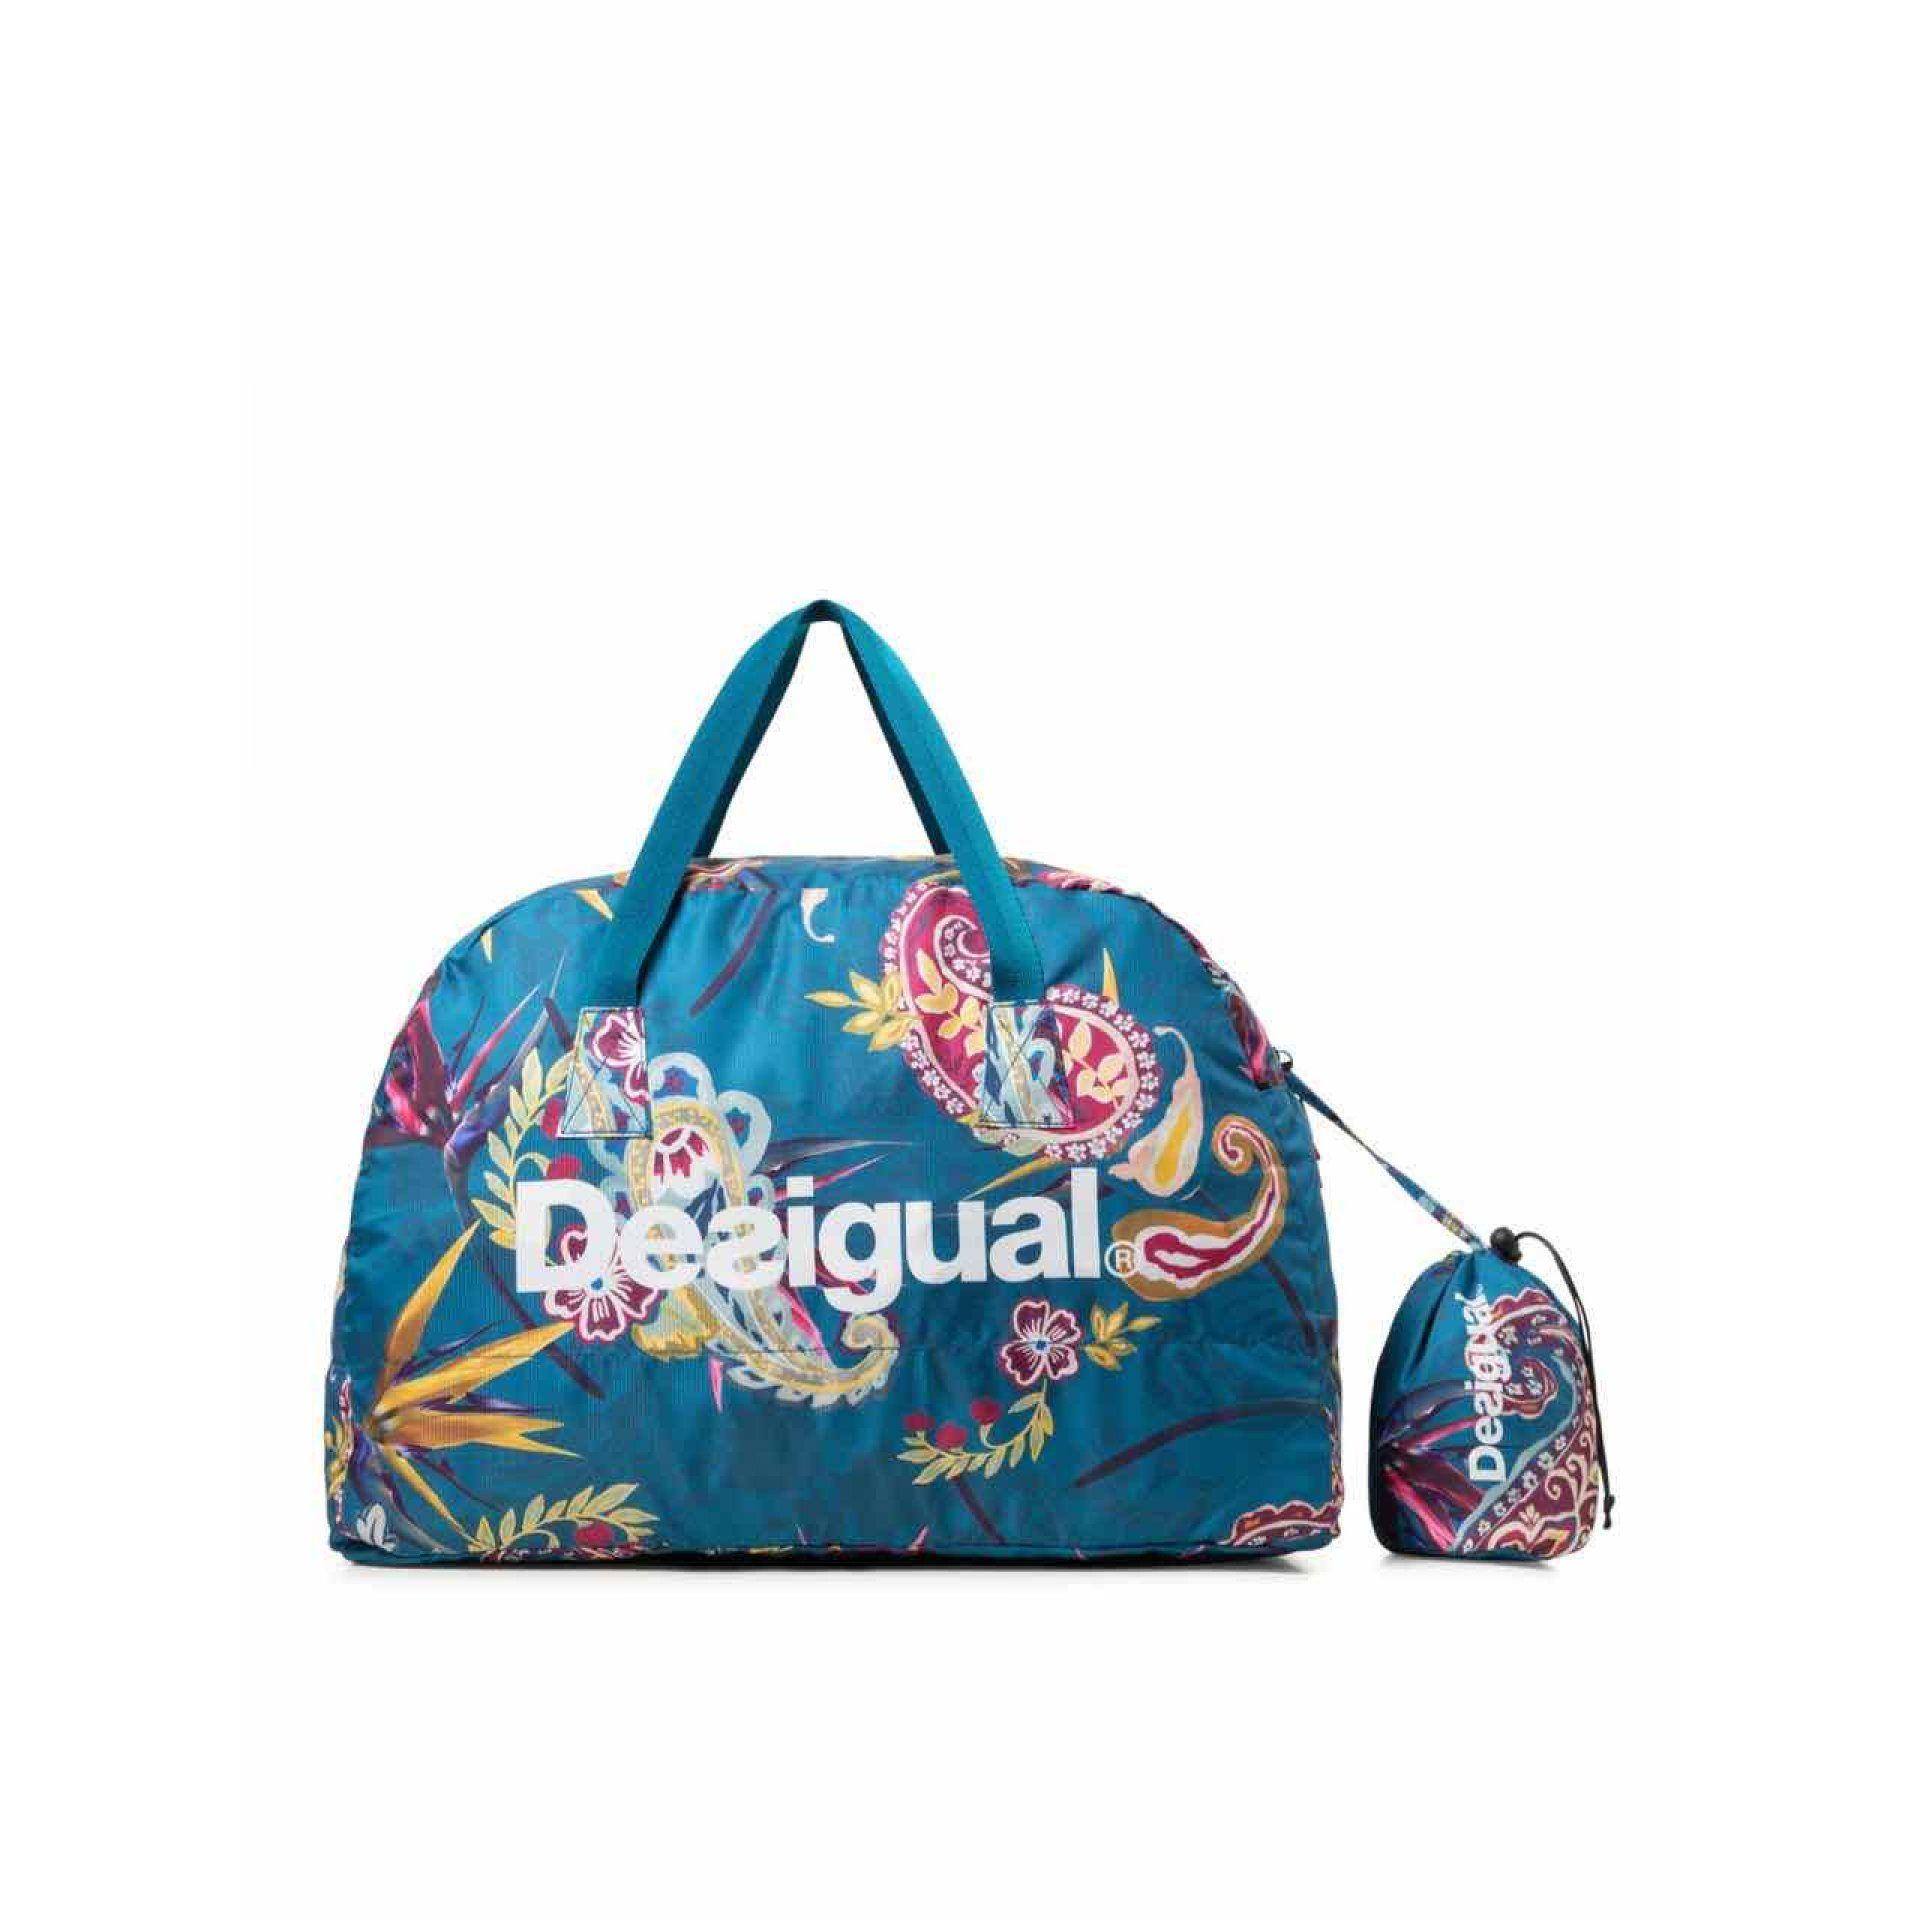 TORBA DESIGUAL PACKABLE BAG ETHNIC 19WQXW16-5049 1